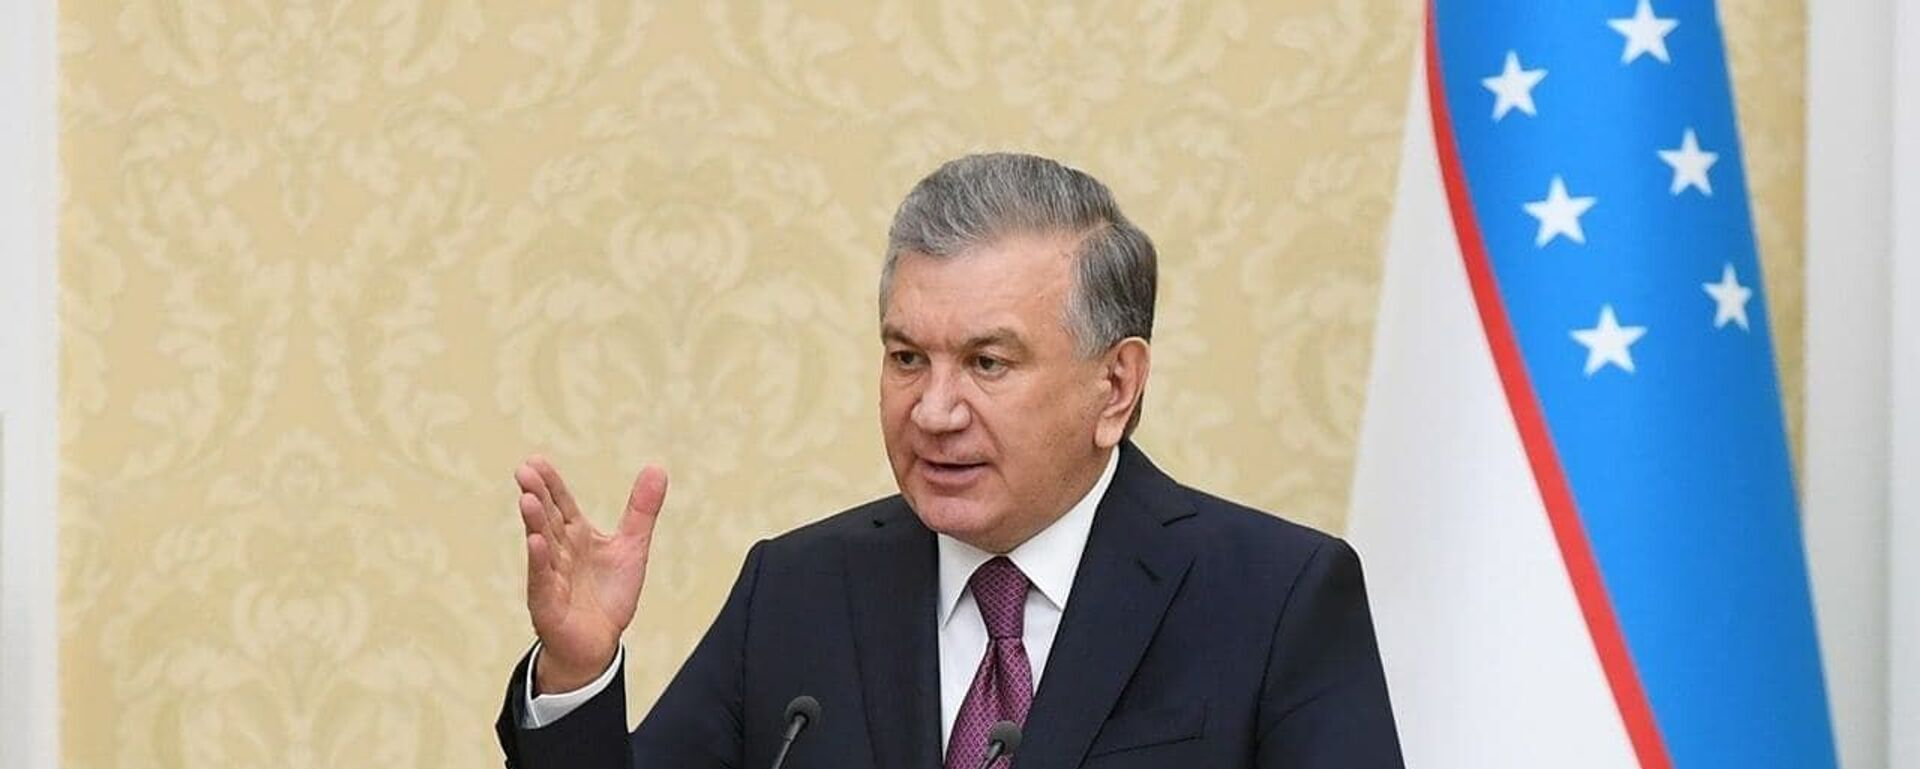 Президент Узбекистана Шавкат Мирзиёев - Sputnik Таджикистан, 1920, 11.12.2020